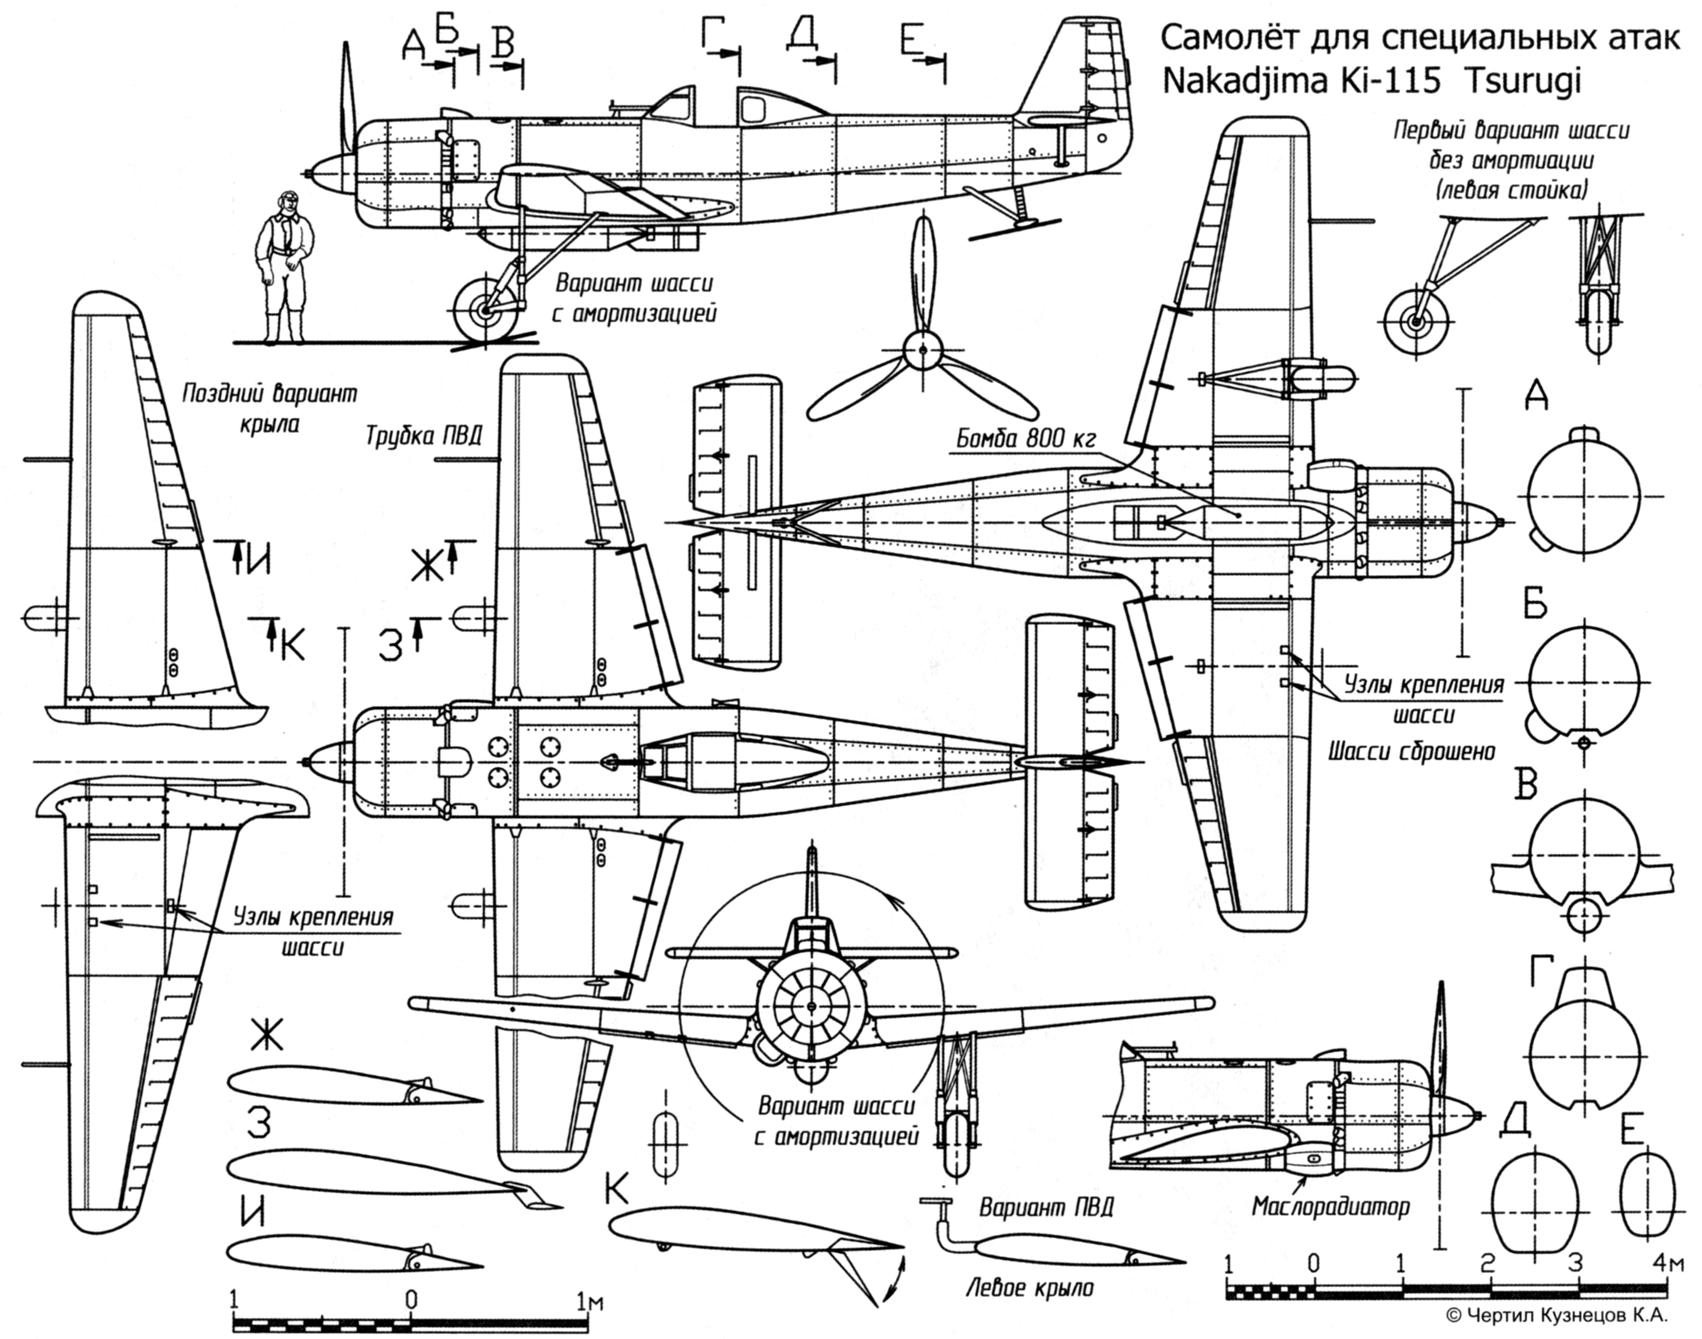 Самолёт для специальных атак Nakadjima Ki-115 Tsurugi